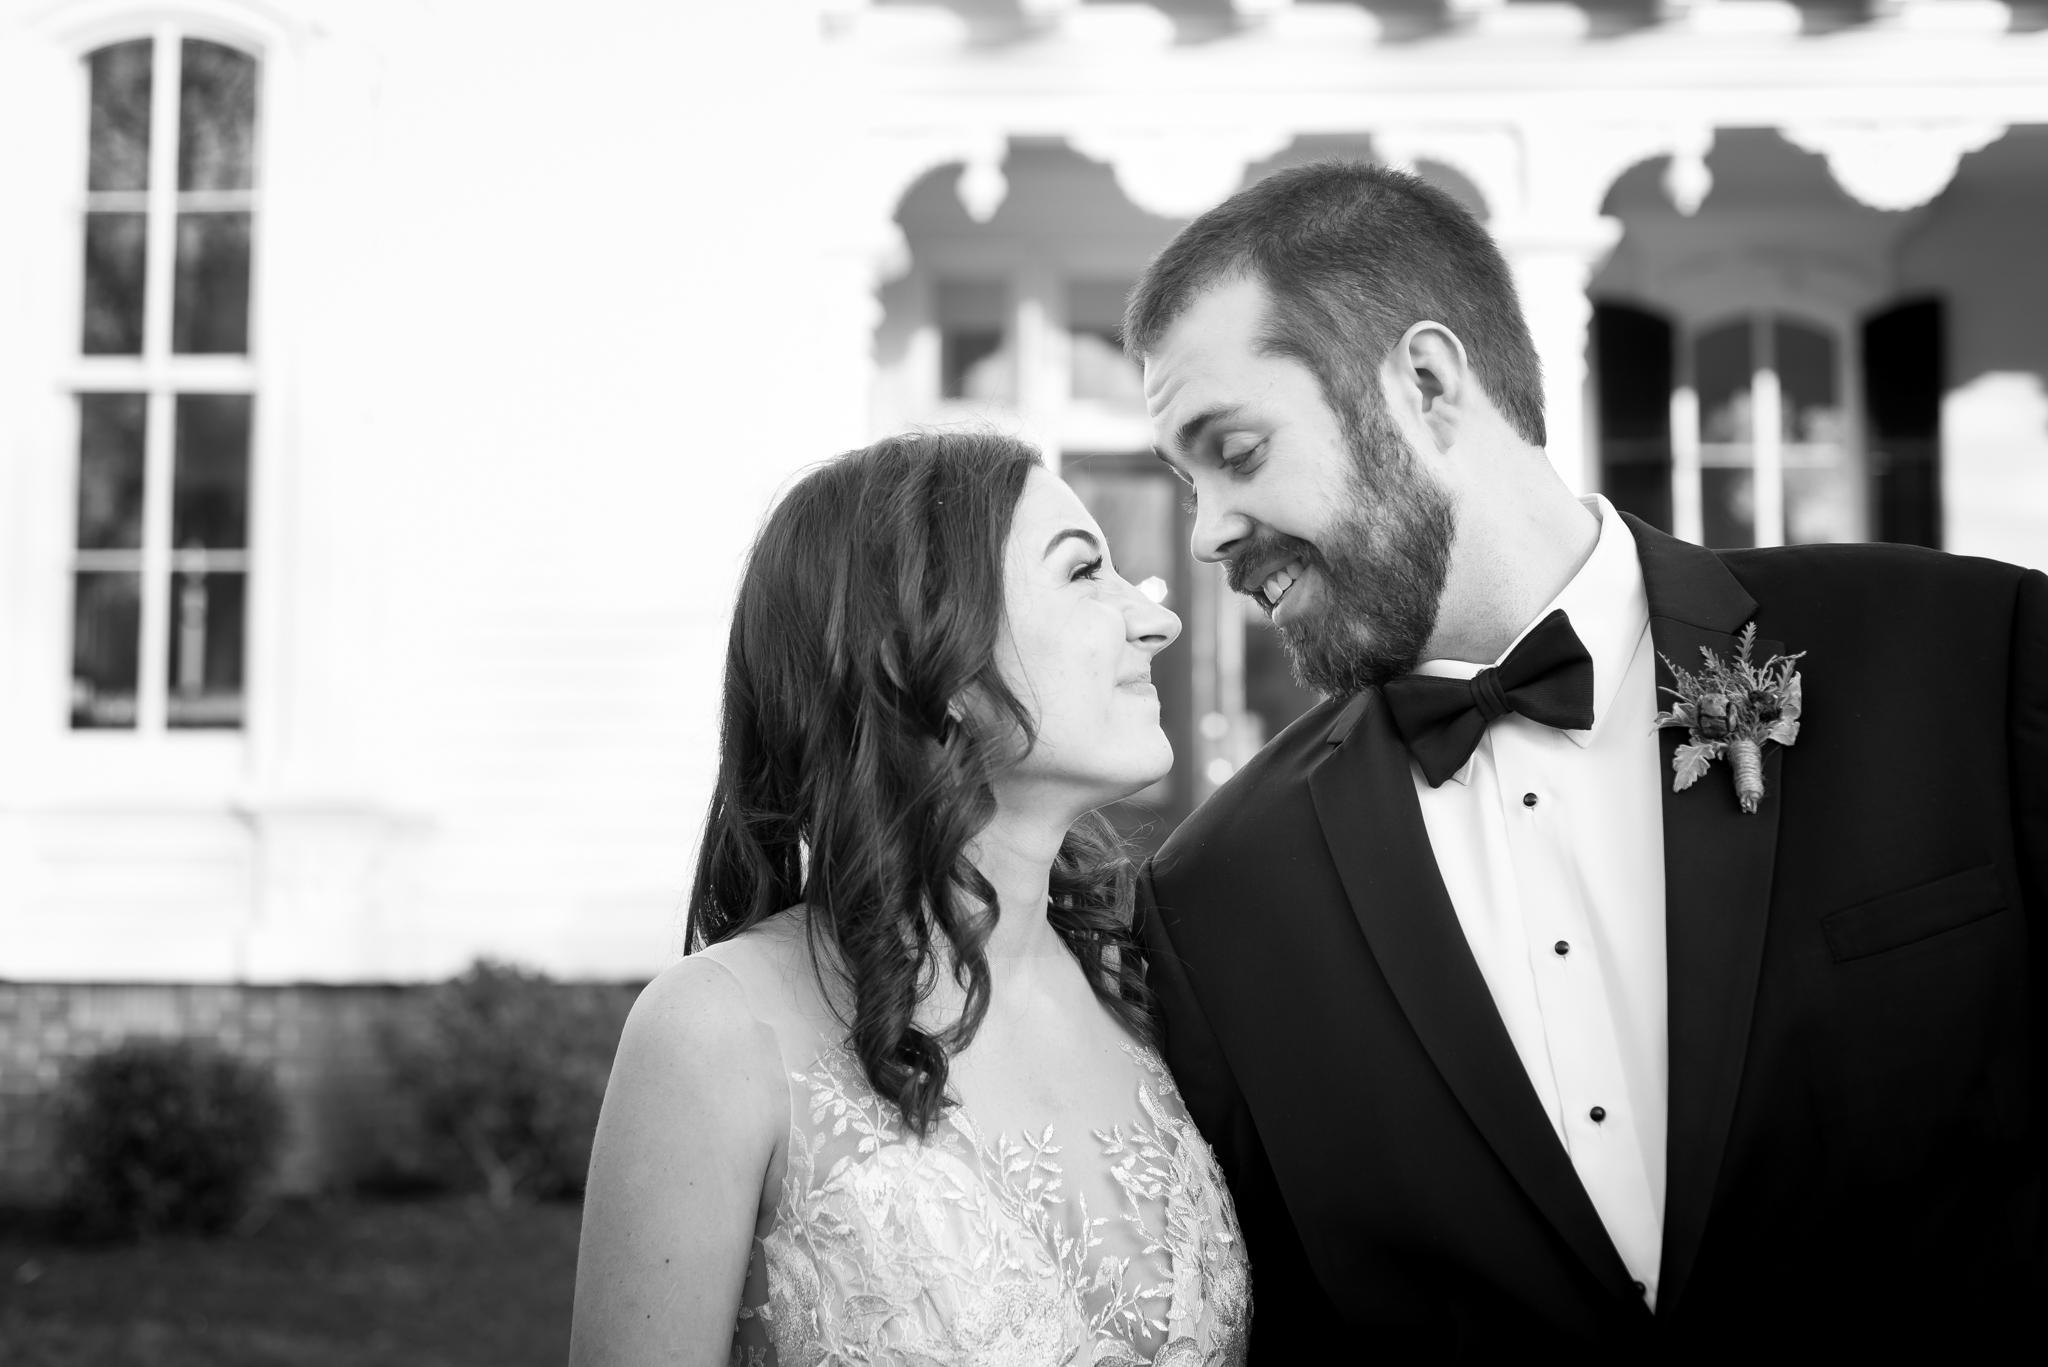 merrimon-wynne-wedding-photography-023.jpg